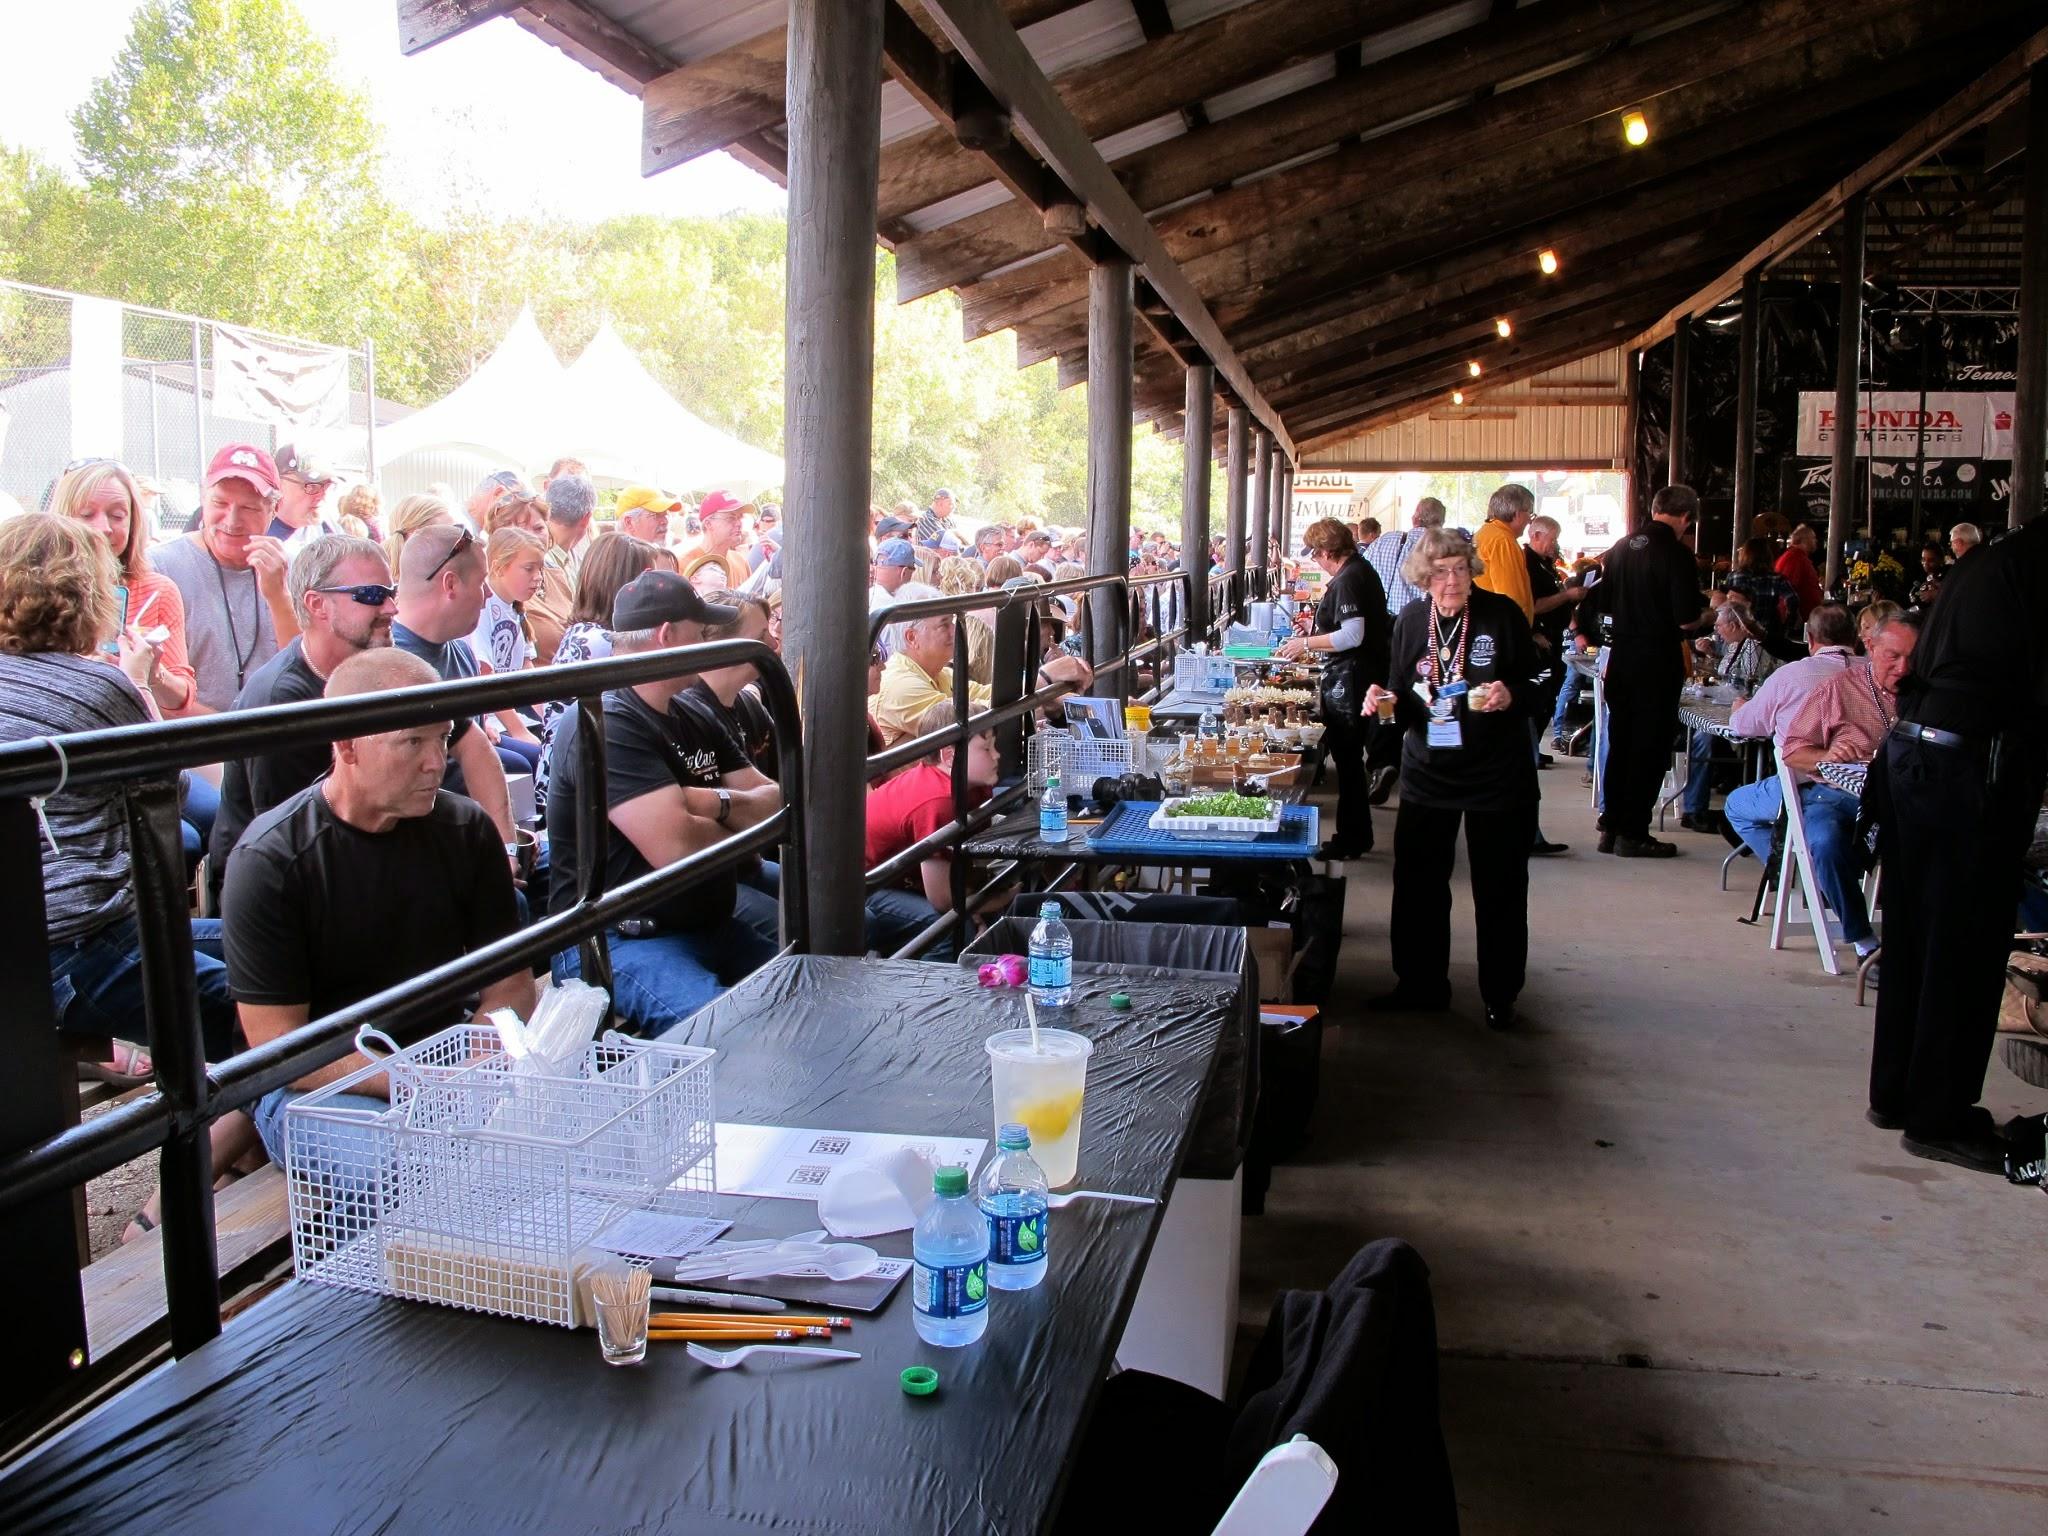 Crowds at Jack Daniel's BBQ Contest